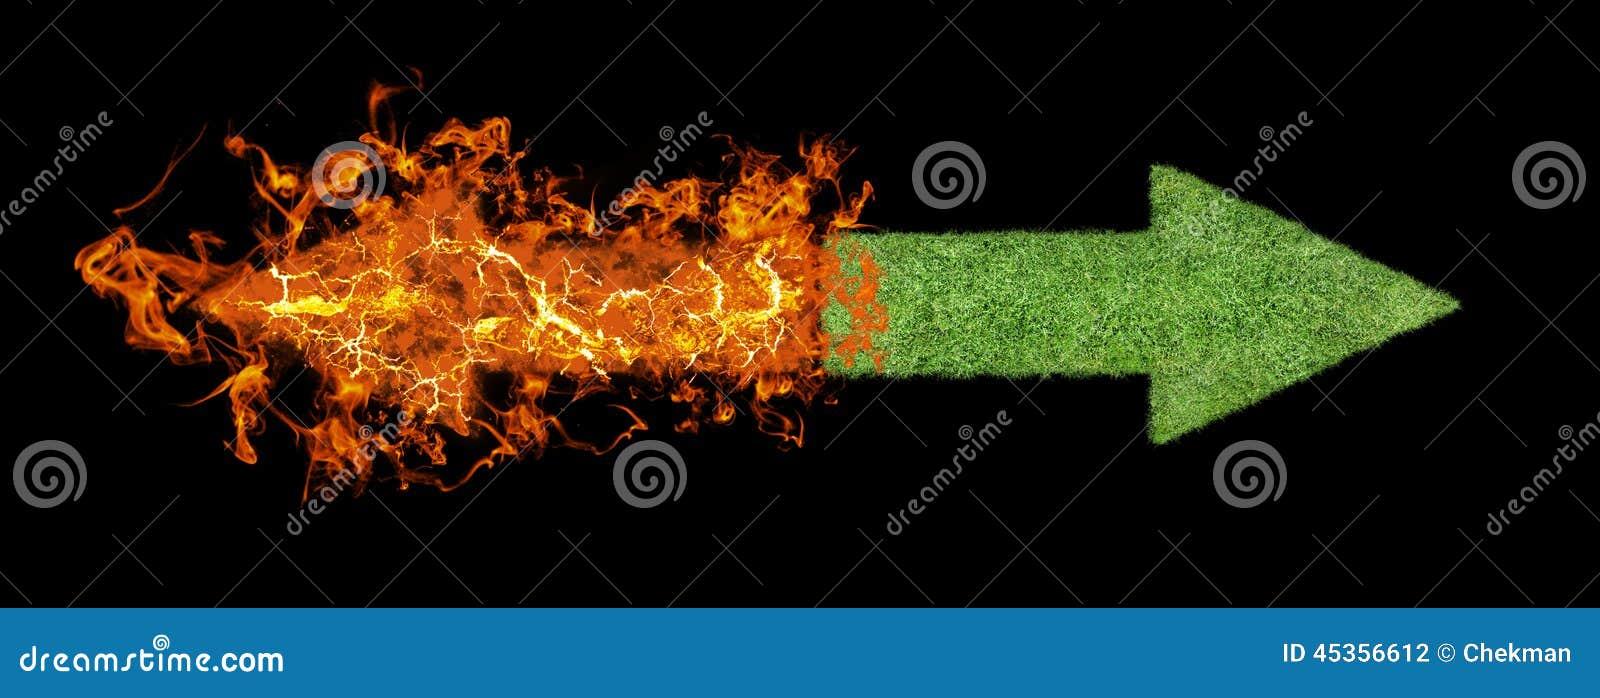 Flèche d herbe verte, flèche en hausse de flamber